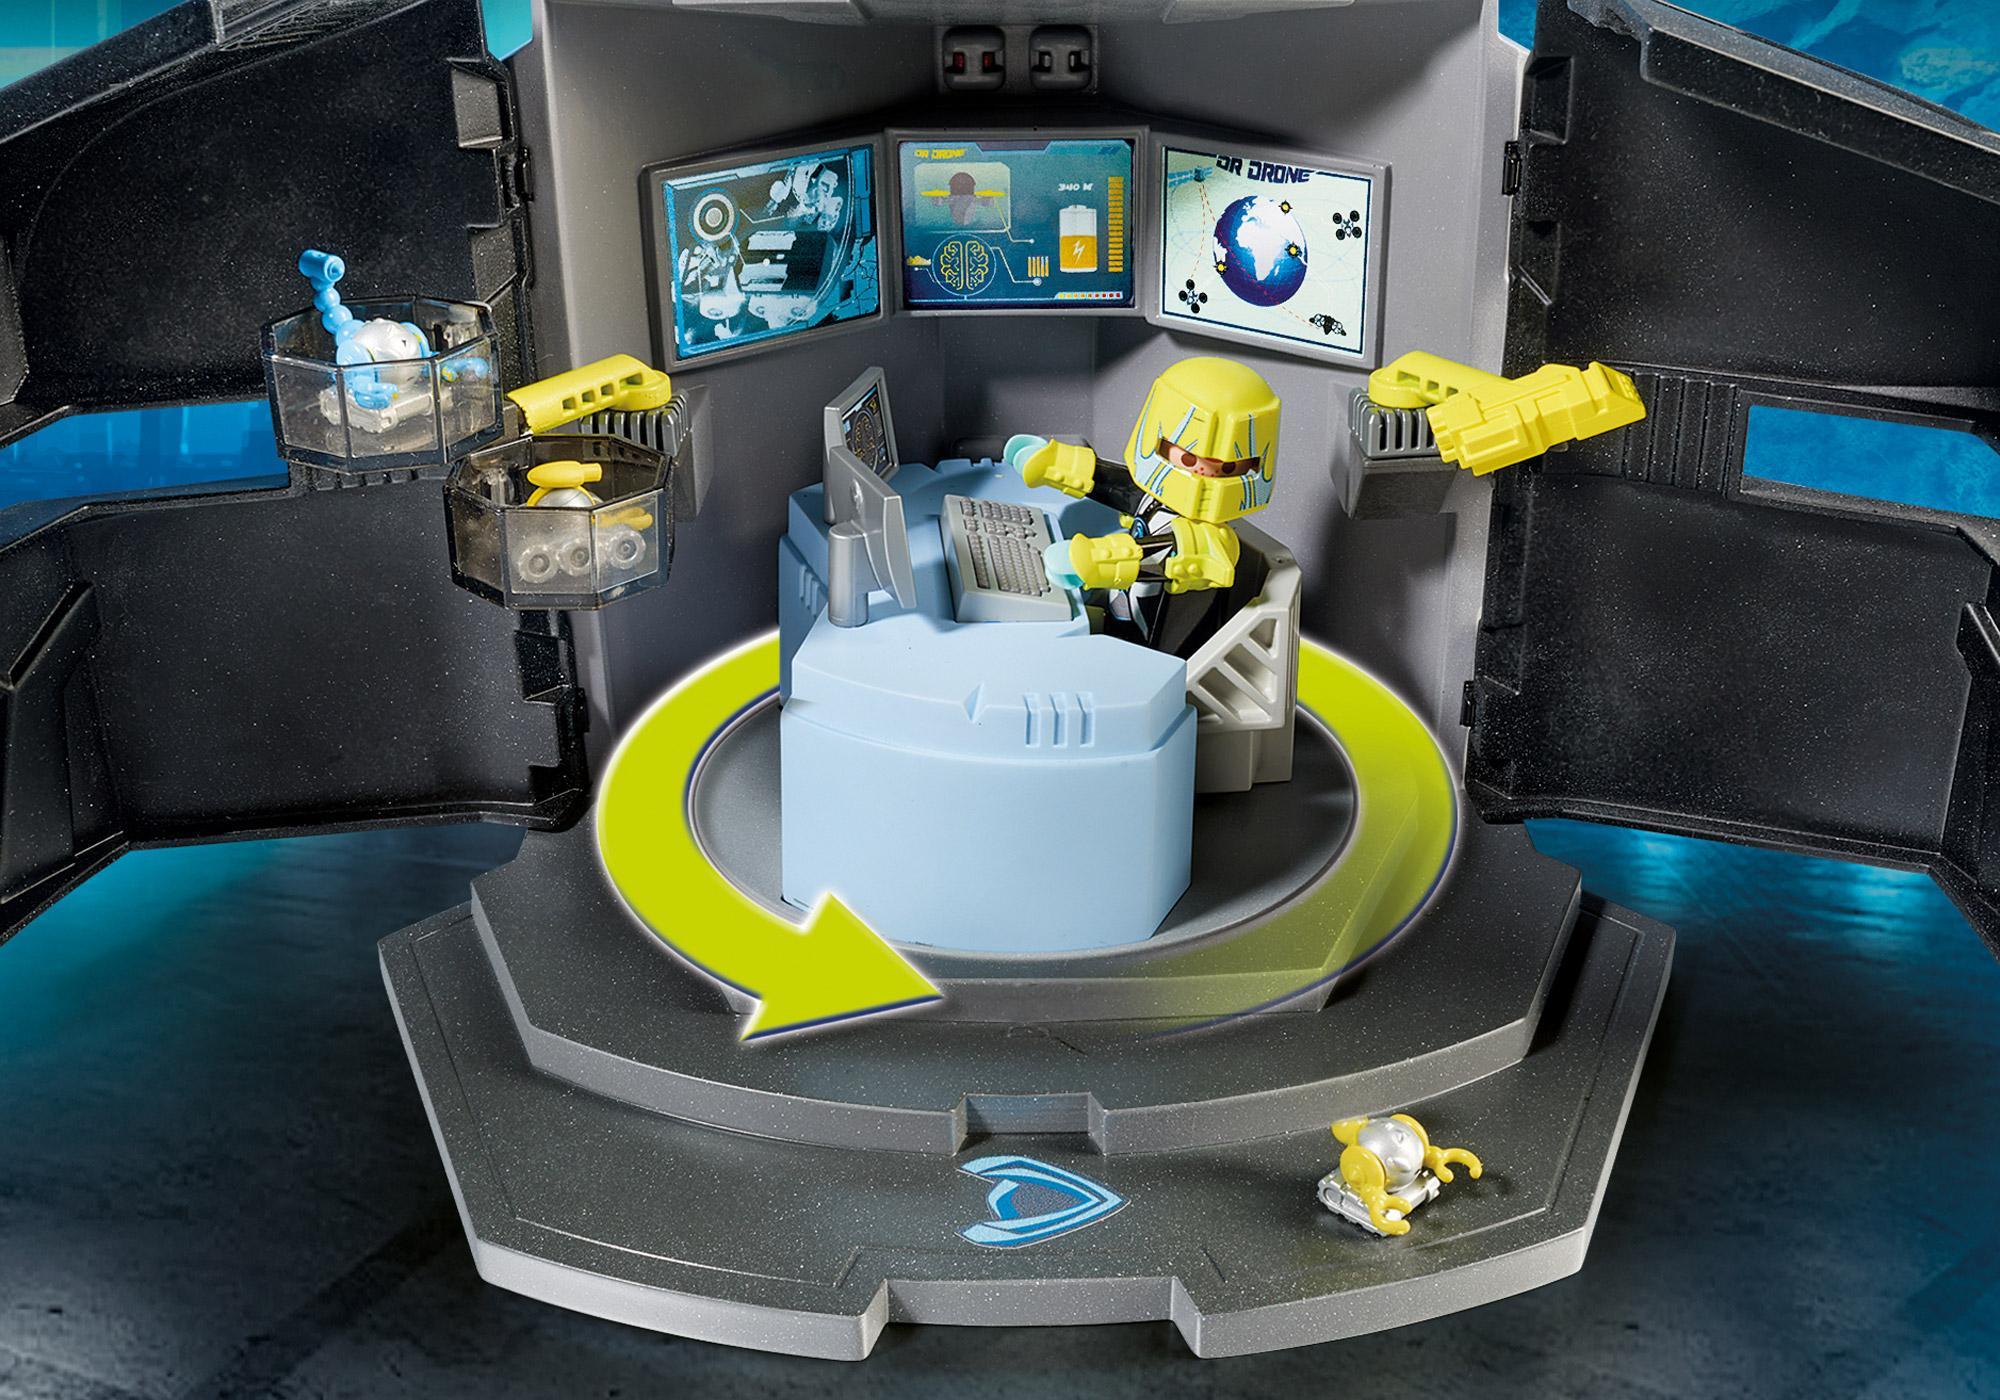 http://media.playmobil.com/i/playmobil/9250_product_extra1/Centre de commandement du Dr. Drone